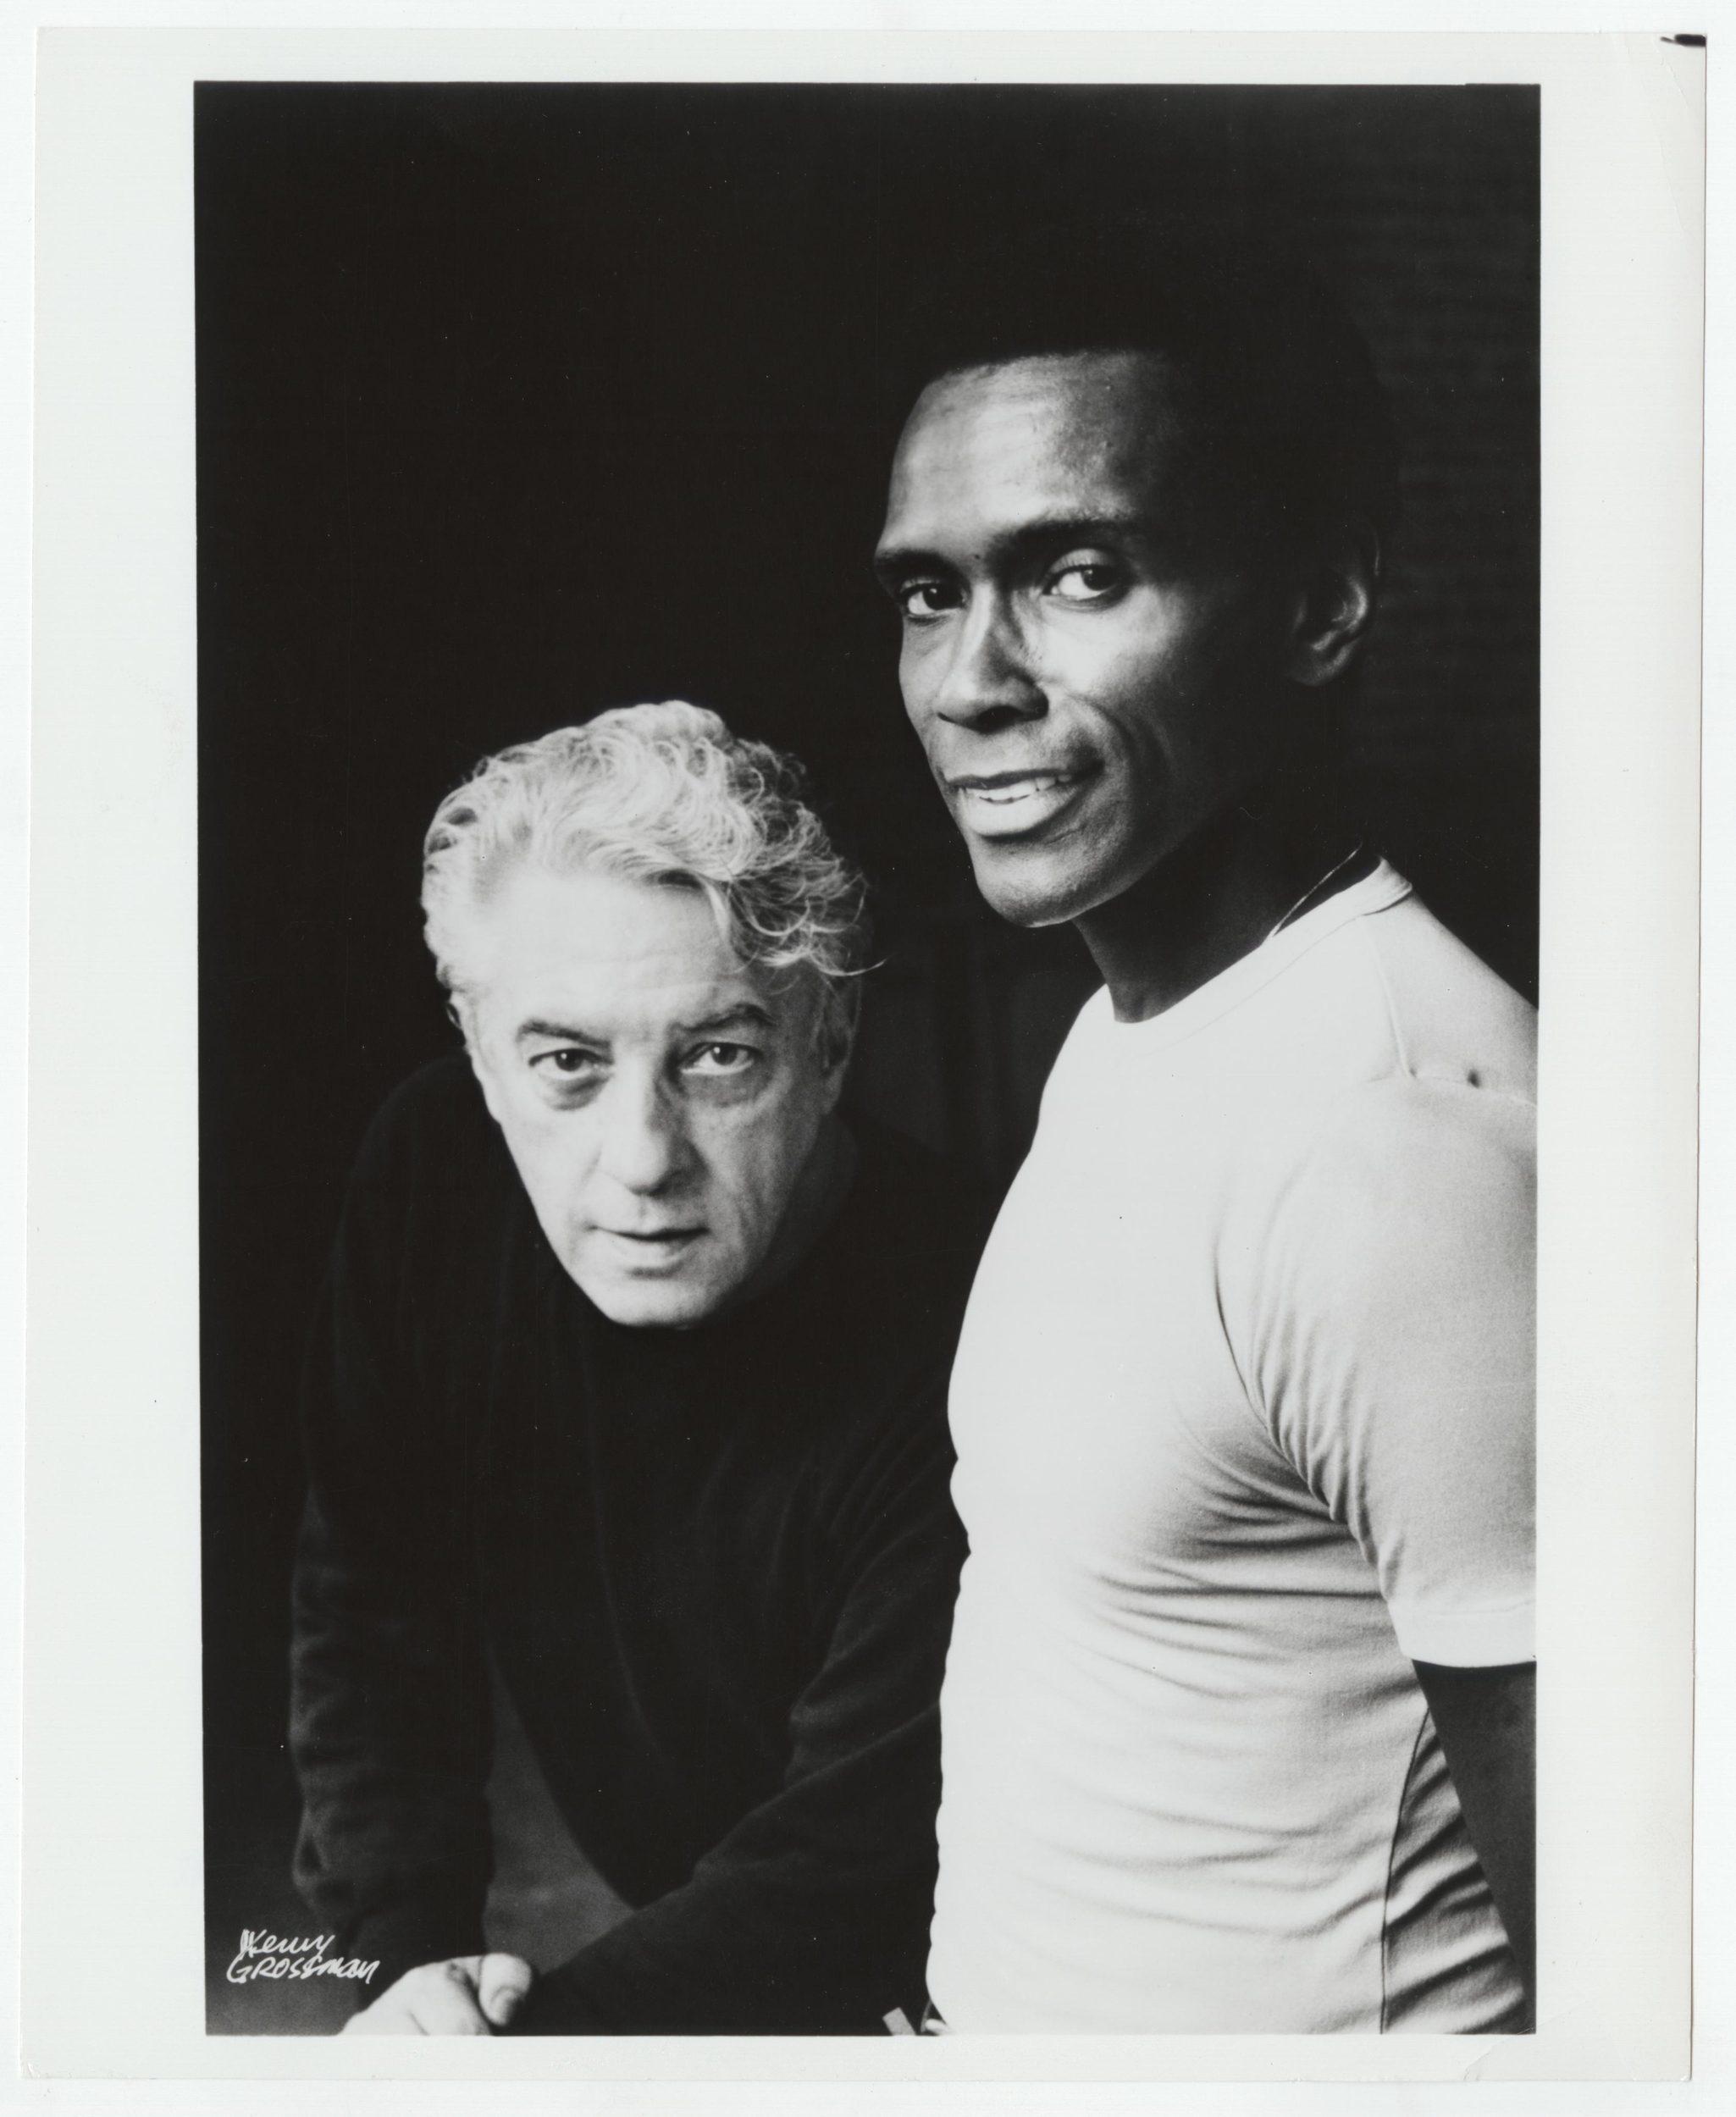 Arthur Mitchell and Karel Shook